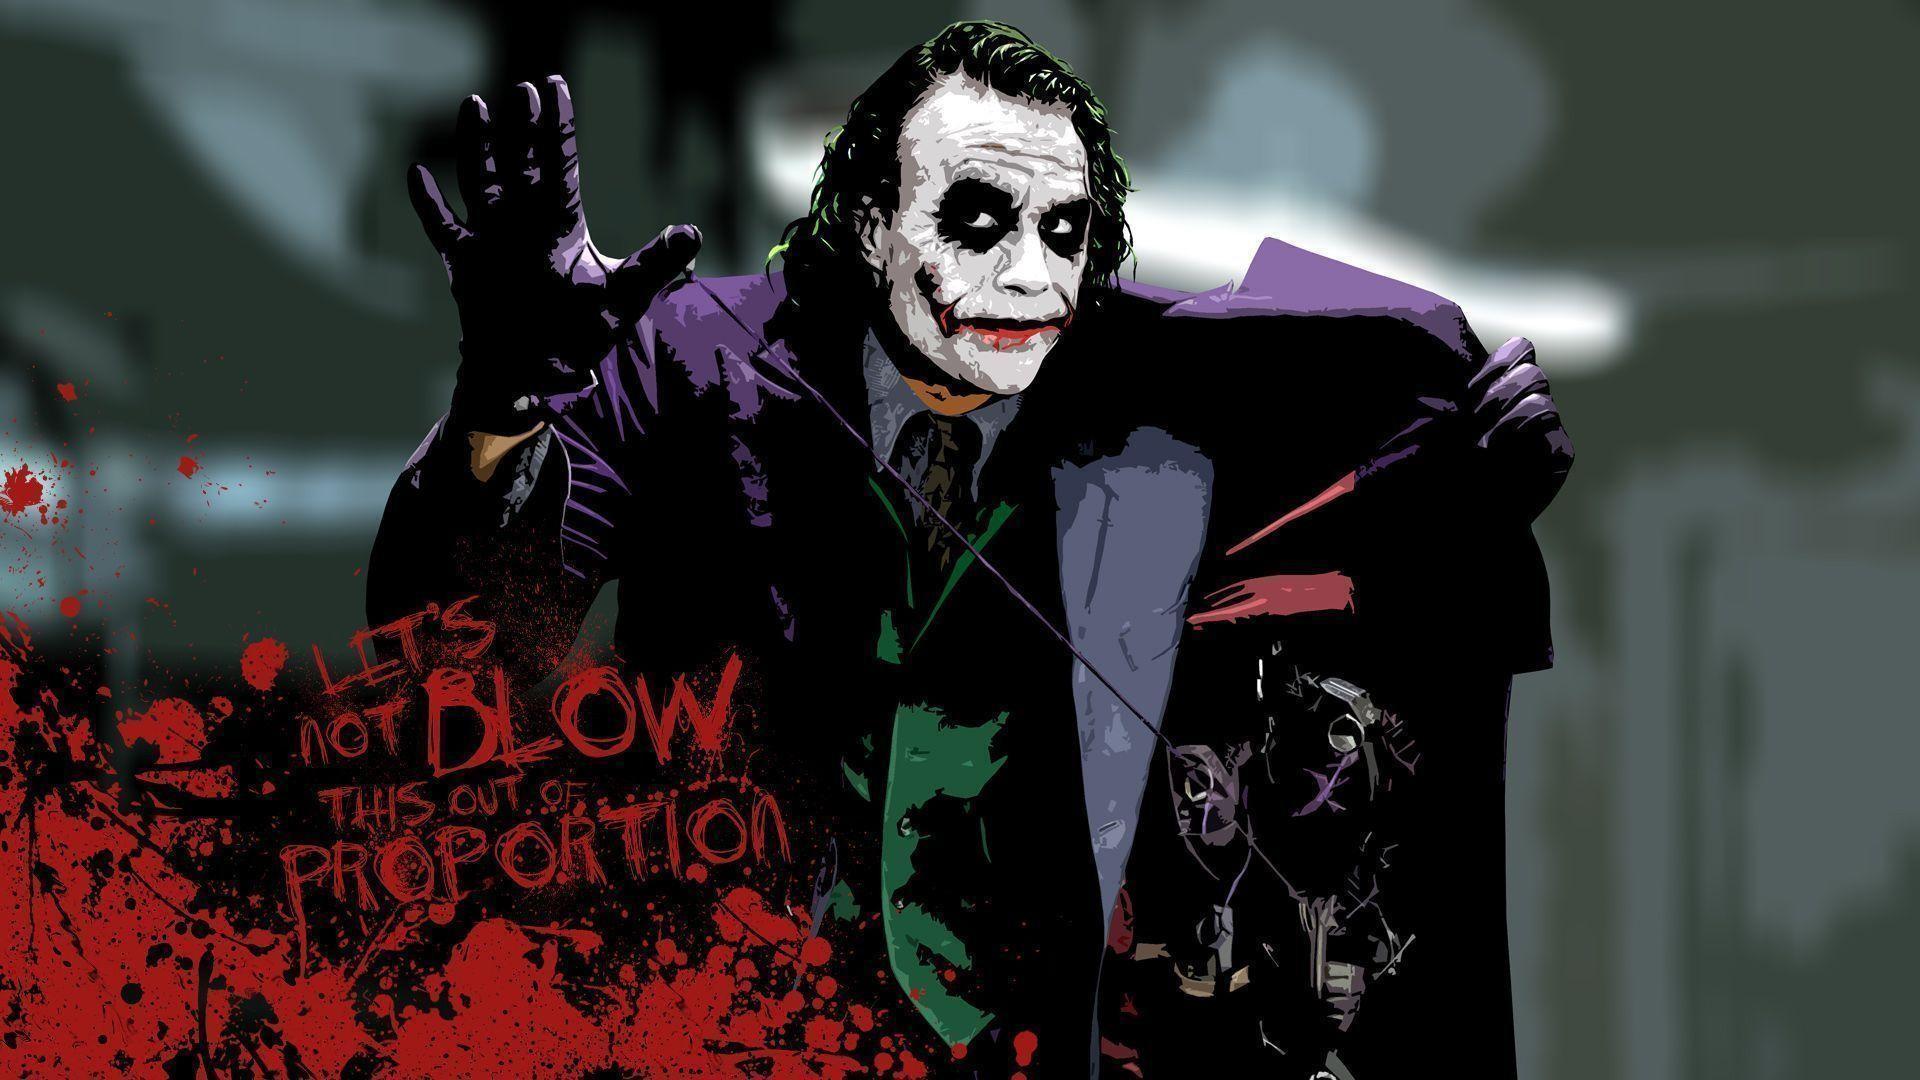 Heath Ledger Joker HD Wallpaper 1920×1080